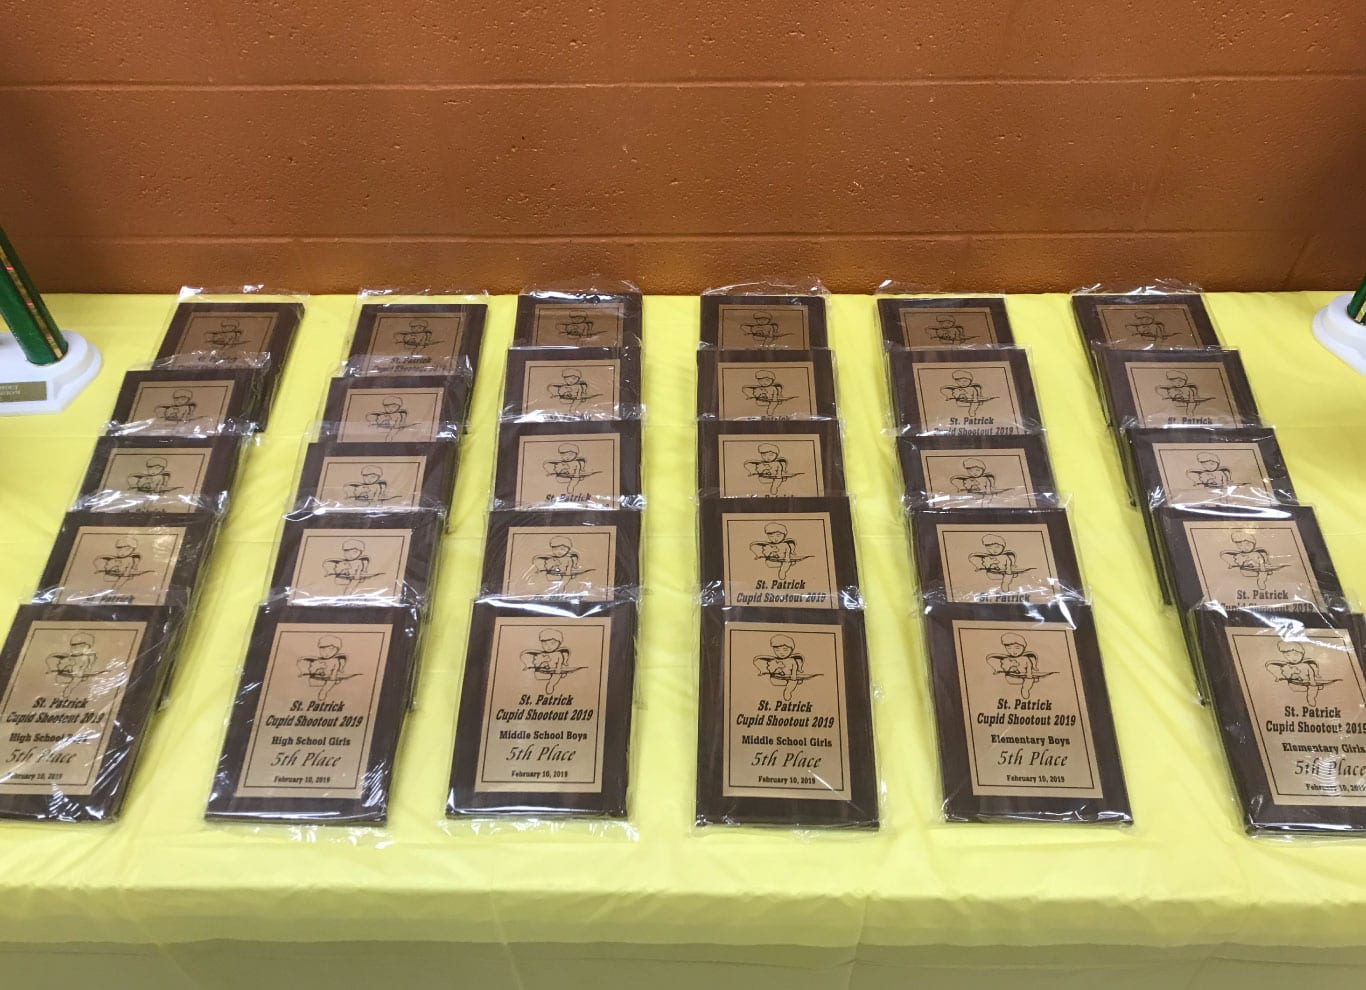 award-plaque-scrolling-award-plaques